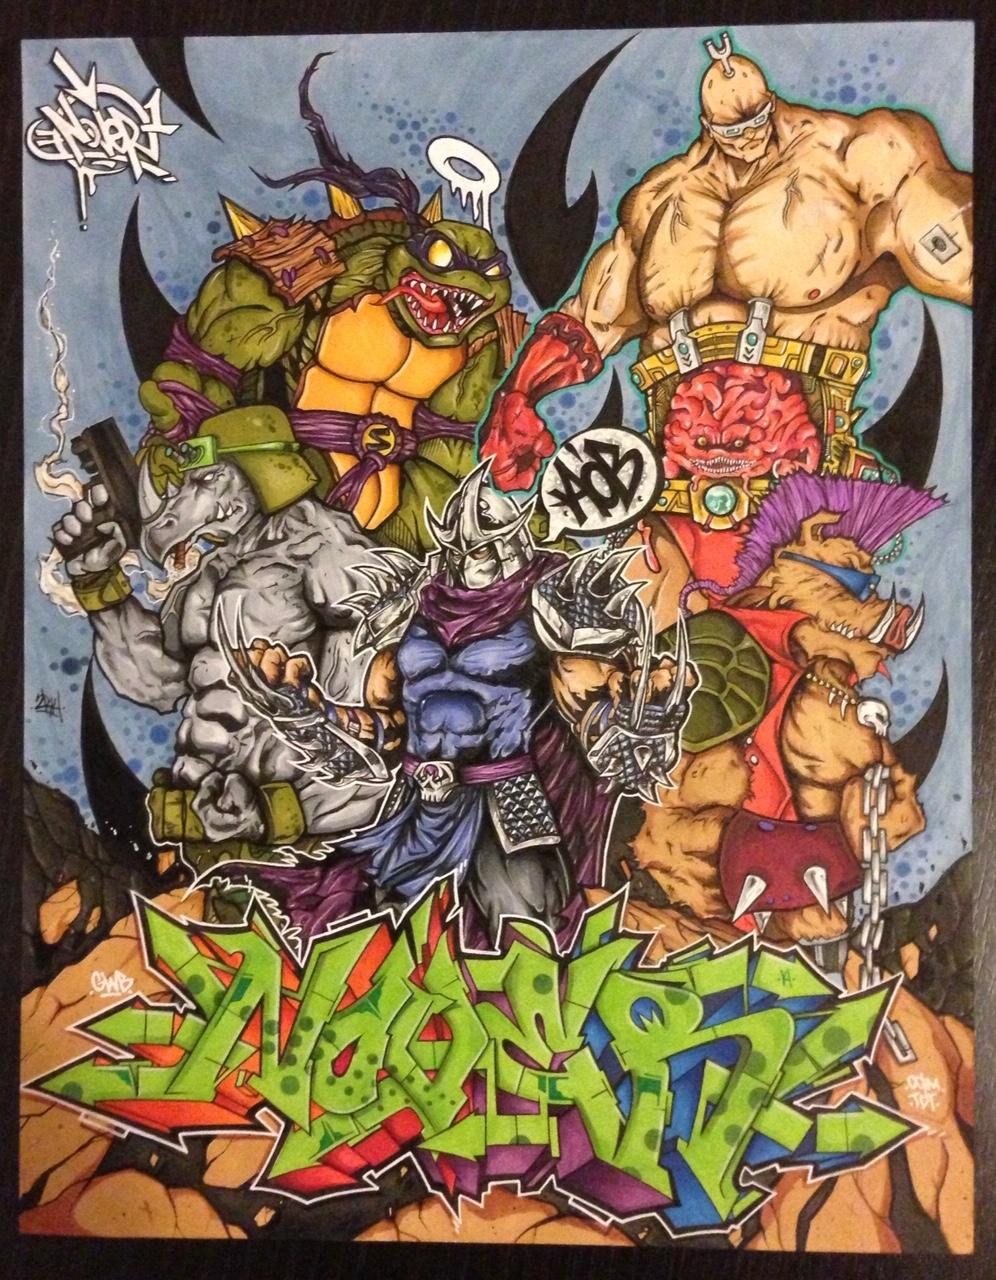 Teenage Mutant Ninja Turtles Villains by Nover, markers & pen on paper, 2014.